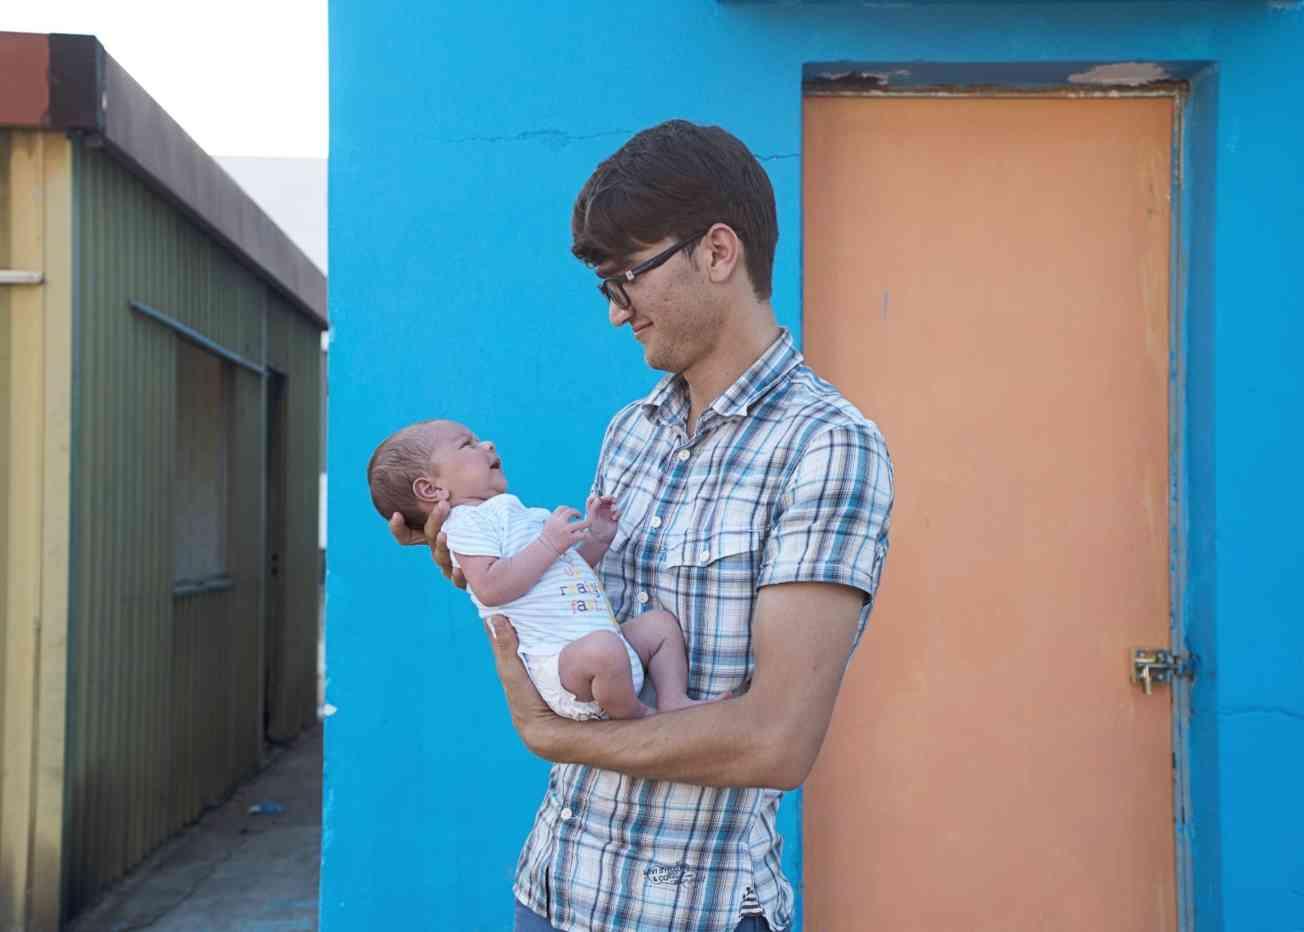 Ahmad and his child 1